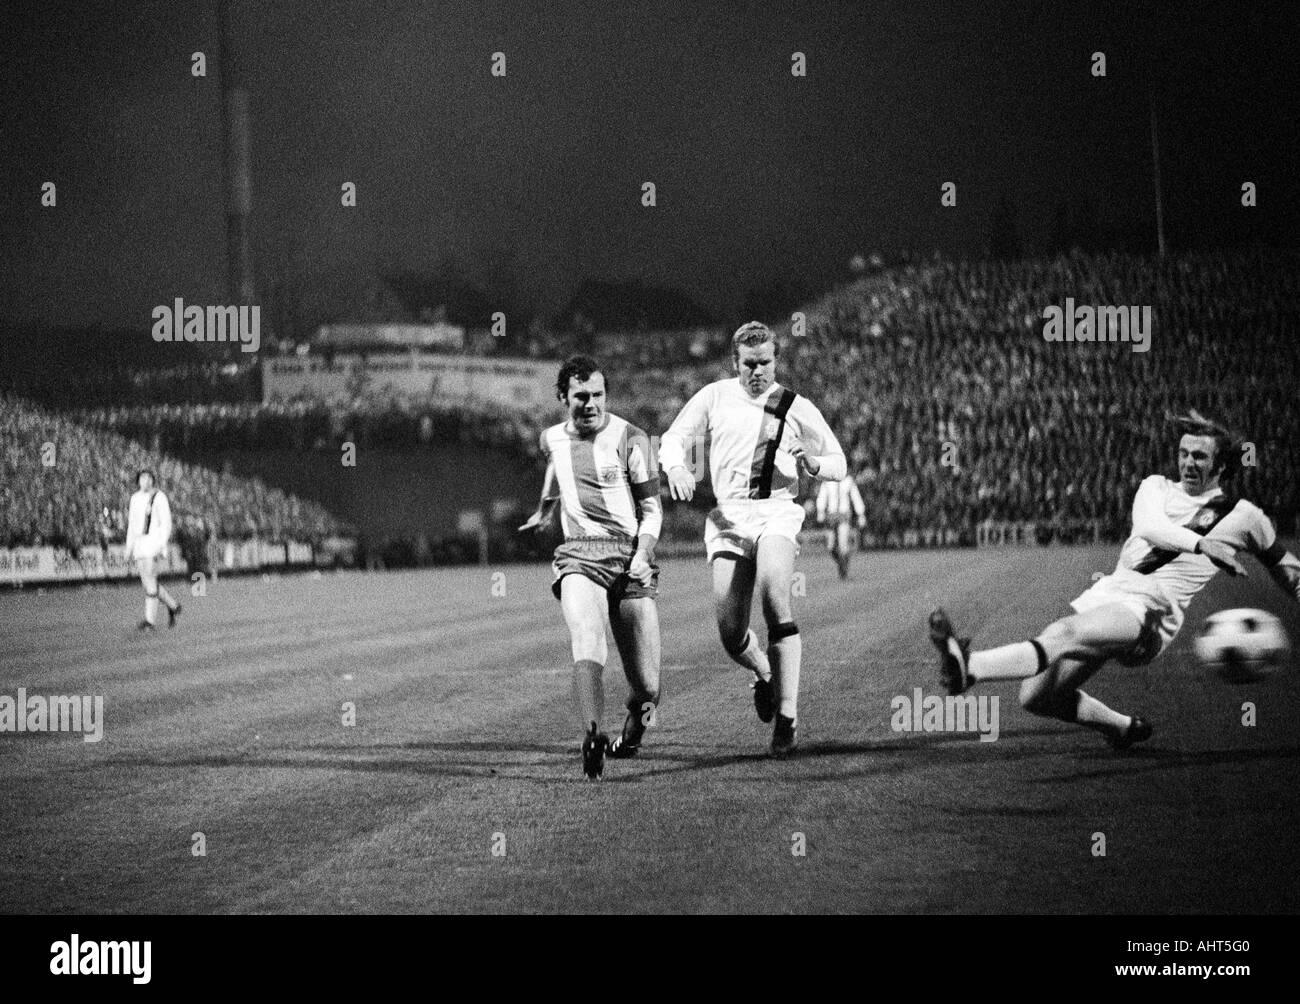 football, Bundesliga, 1970/1971, Borussia Moenchengladbach versus FC Bayern Munich 3:1, Boekelberg Stadium, scene of the match, f.l.t.r. Franz Beckenbauer (FCB), Klaus Dieter Sieloff, Guenter Netzer (both MG) - Stock Image